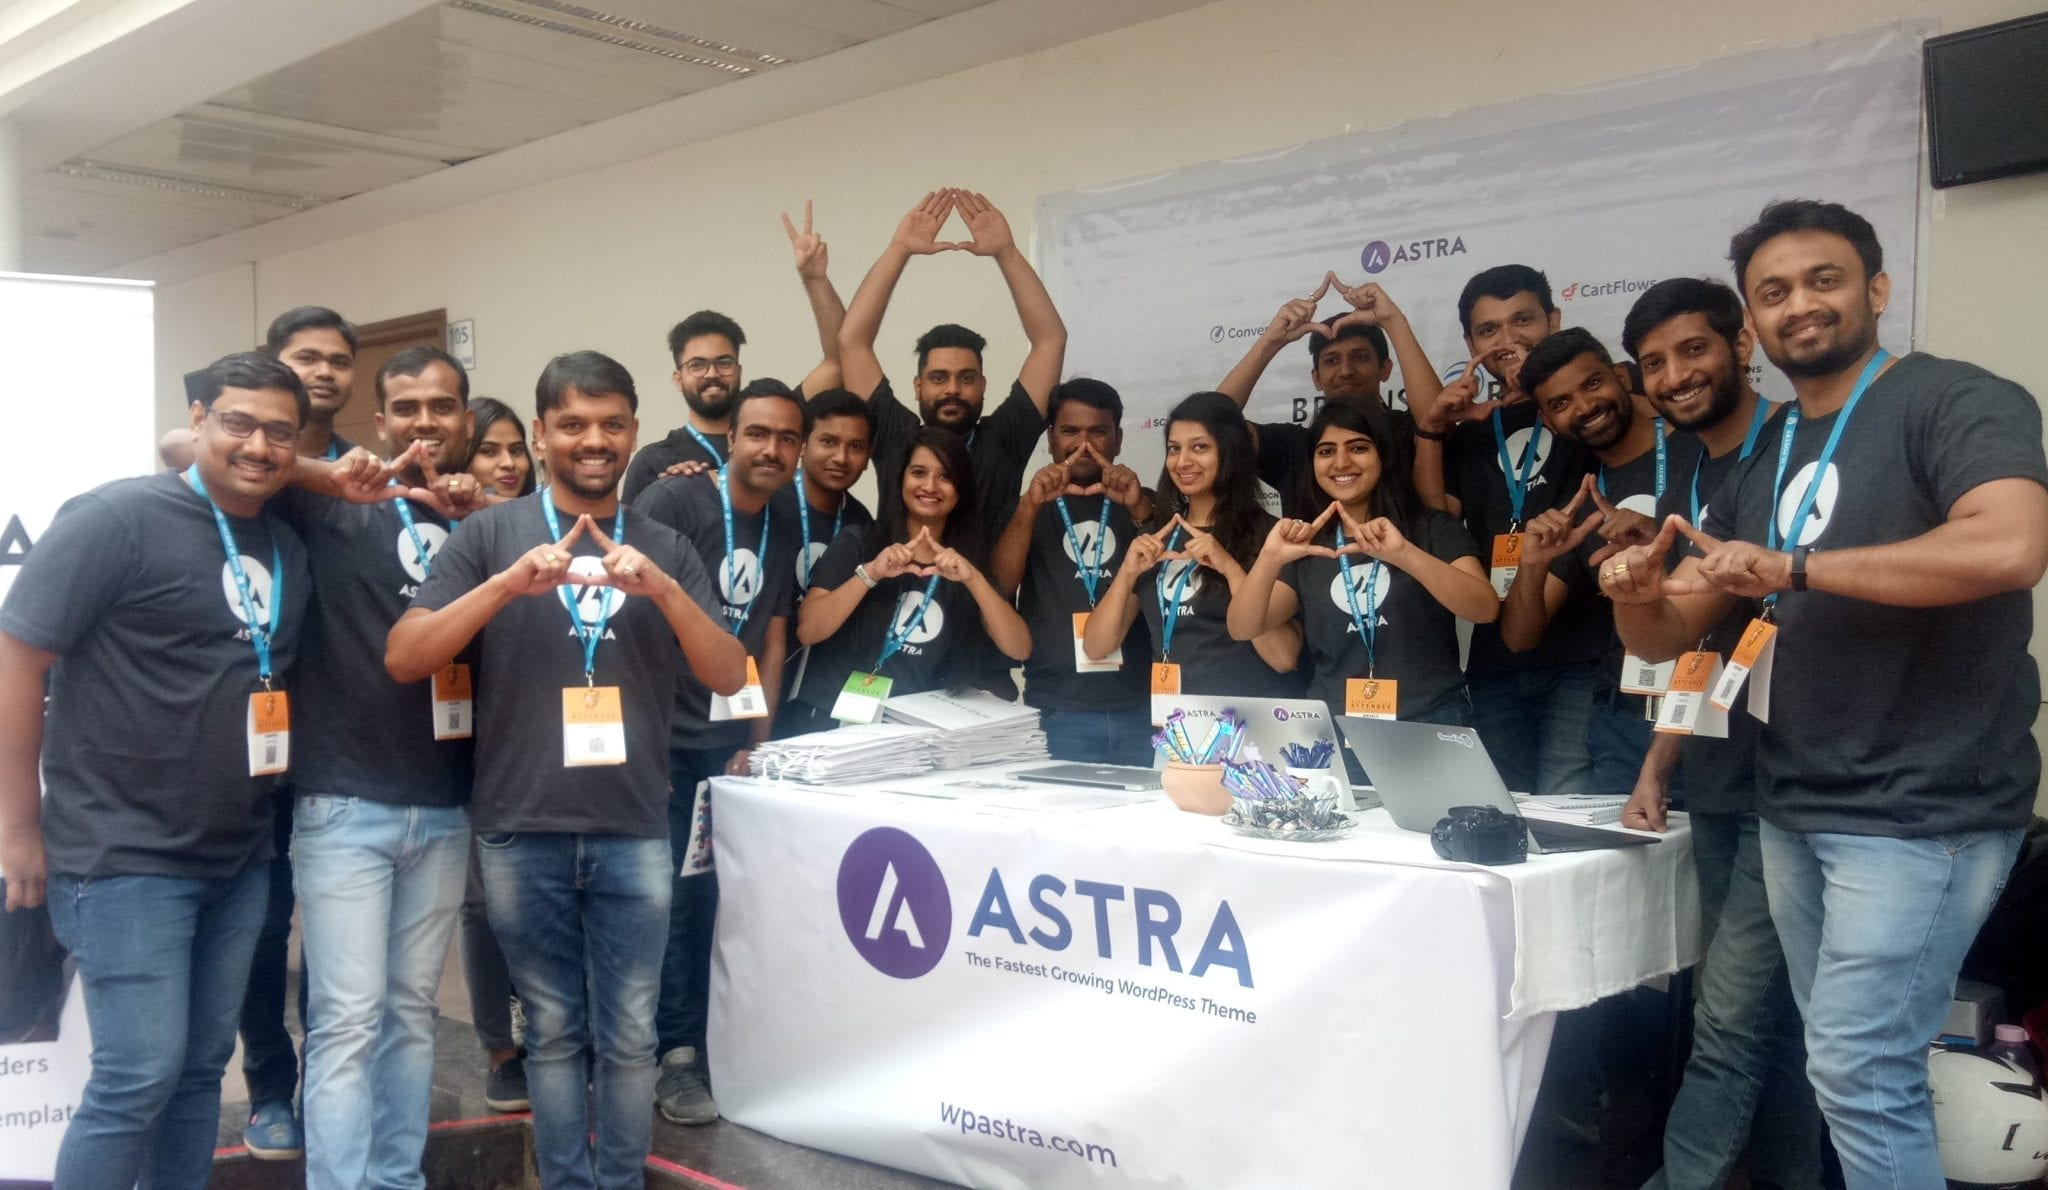 Astra team